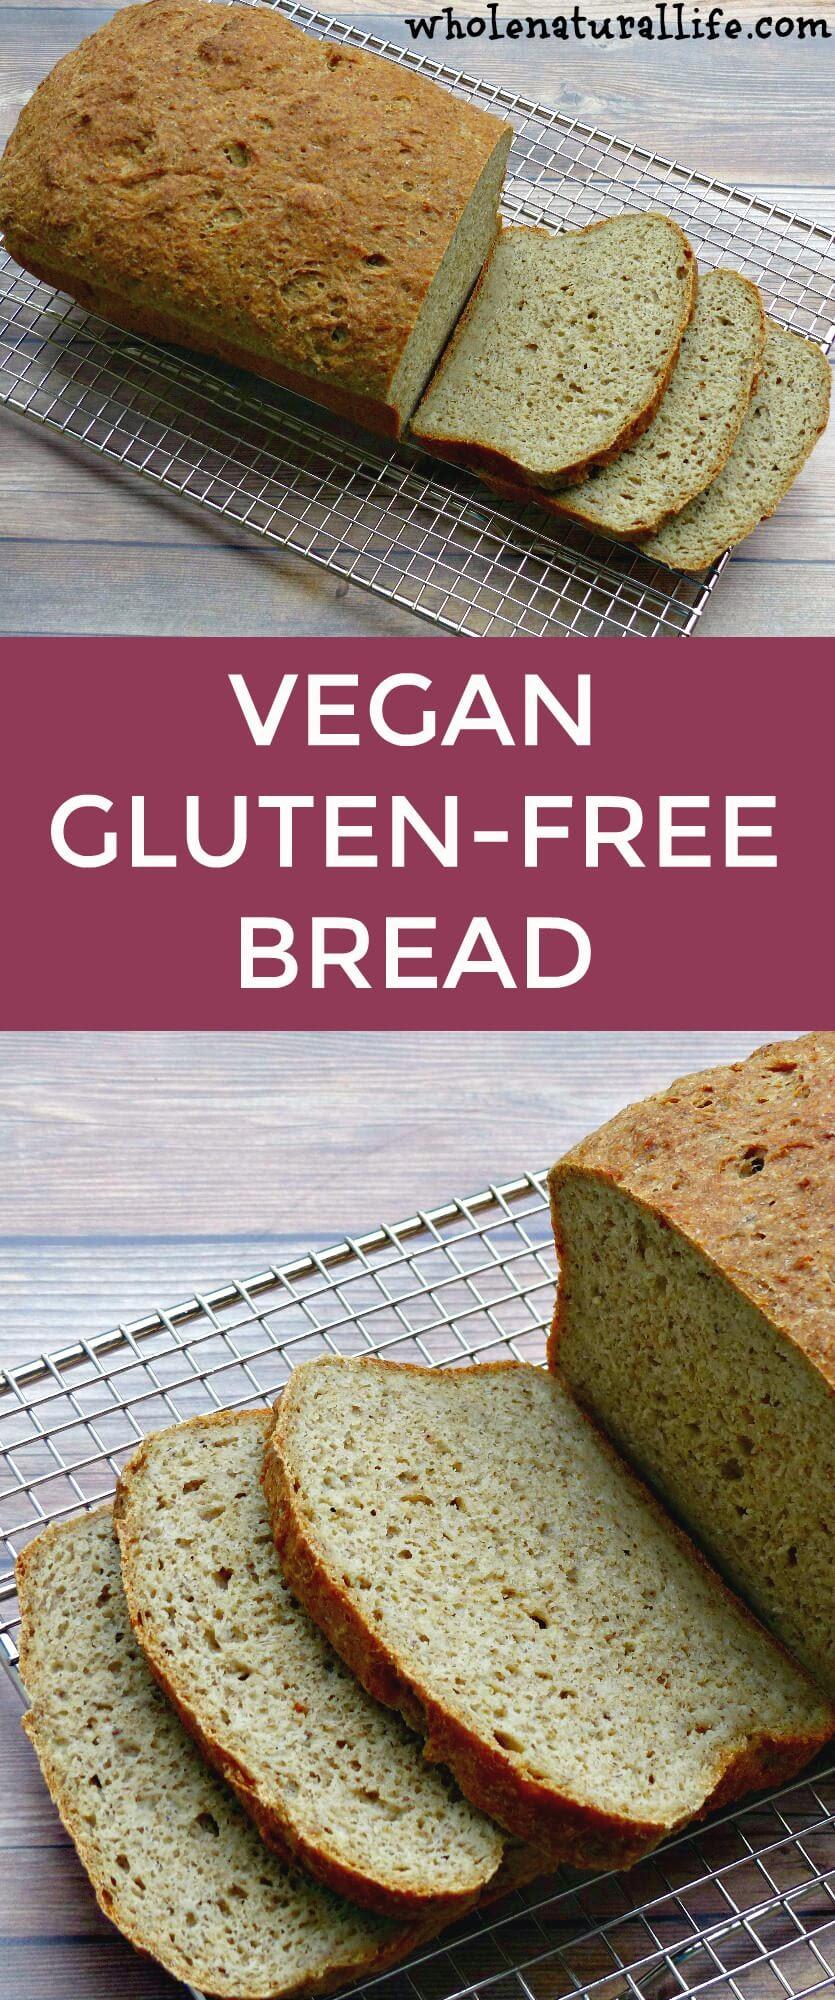 Vegan Gluten-free Bread - Whole Natural Life